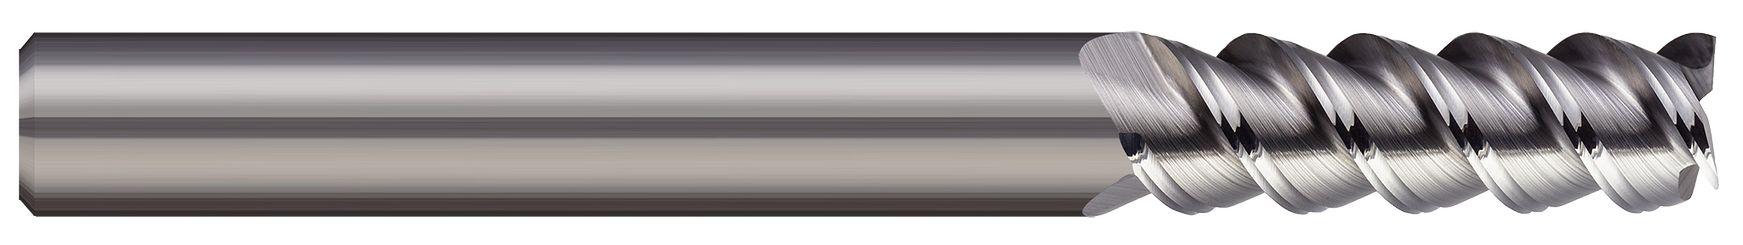 tool-details-SDH-375-04